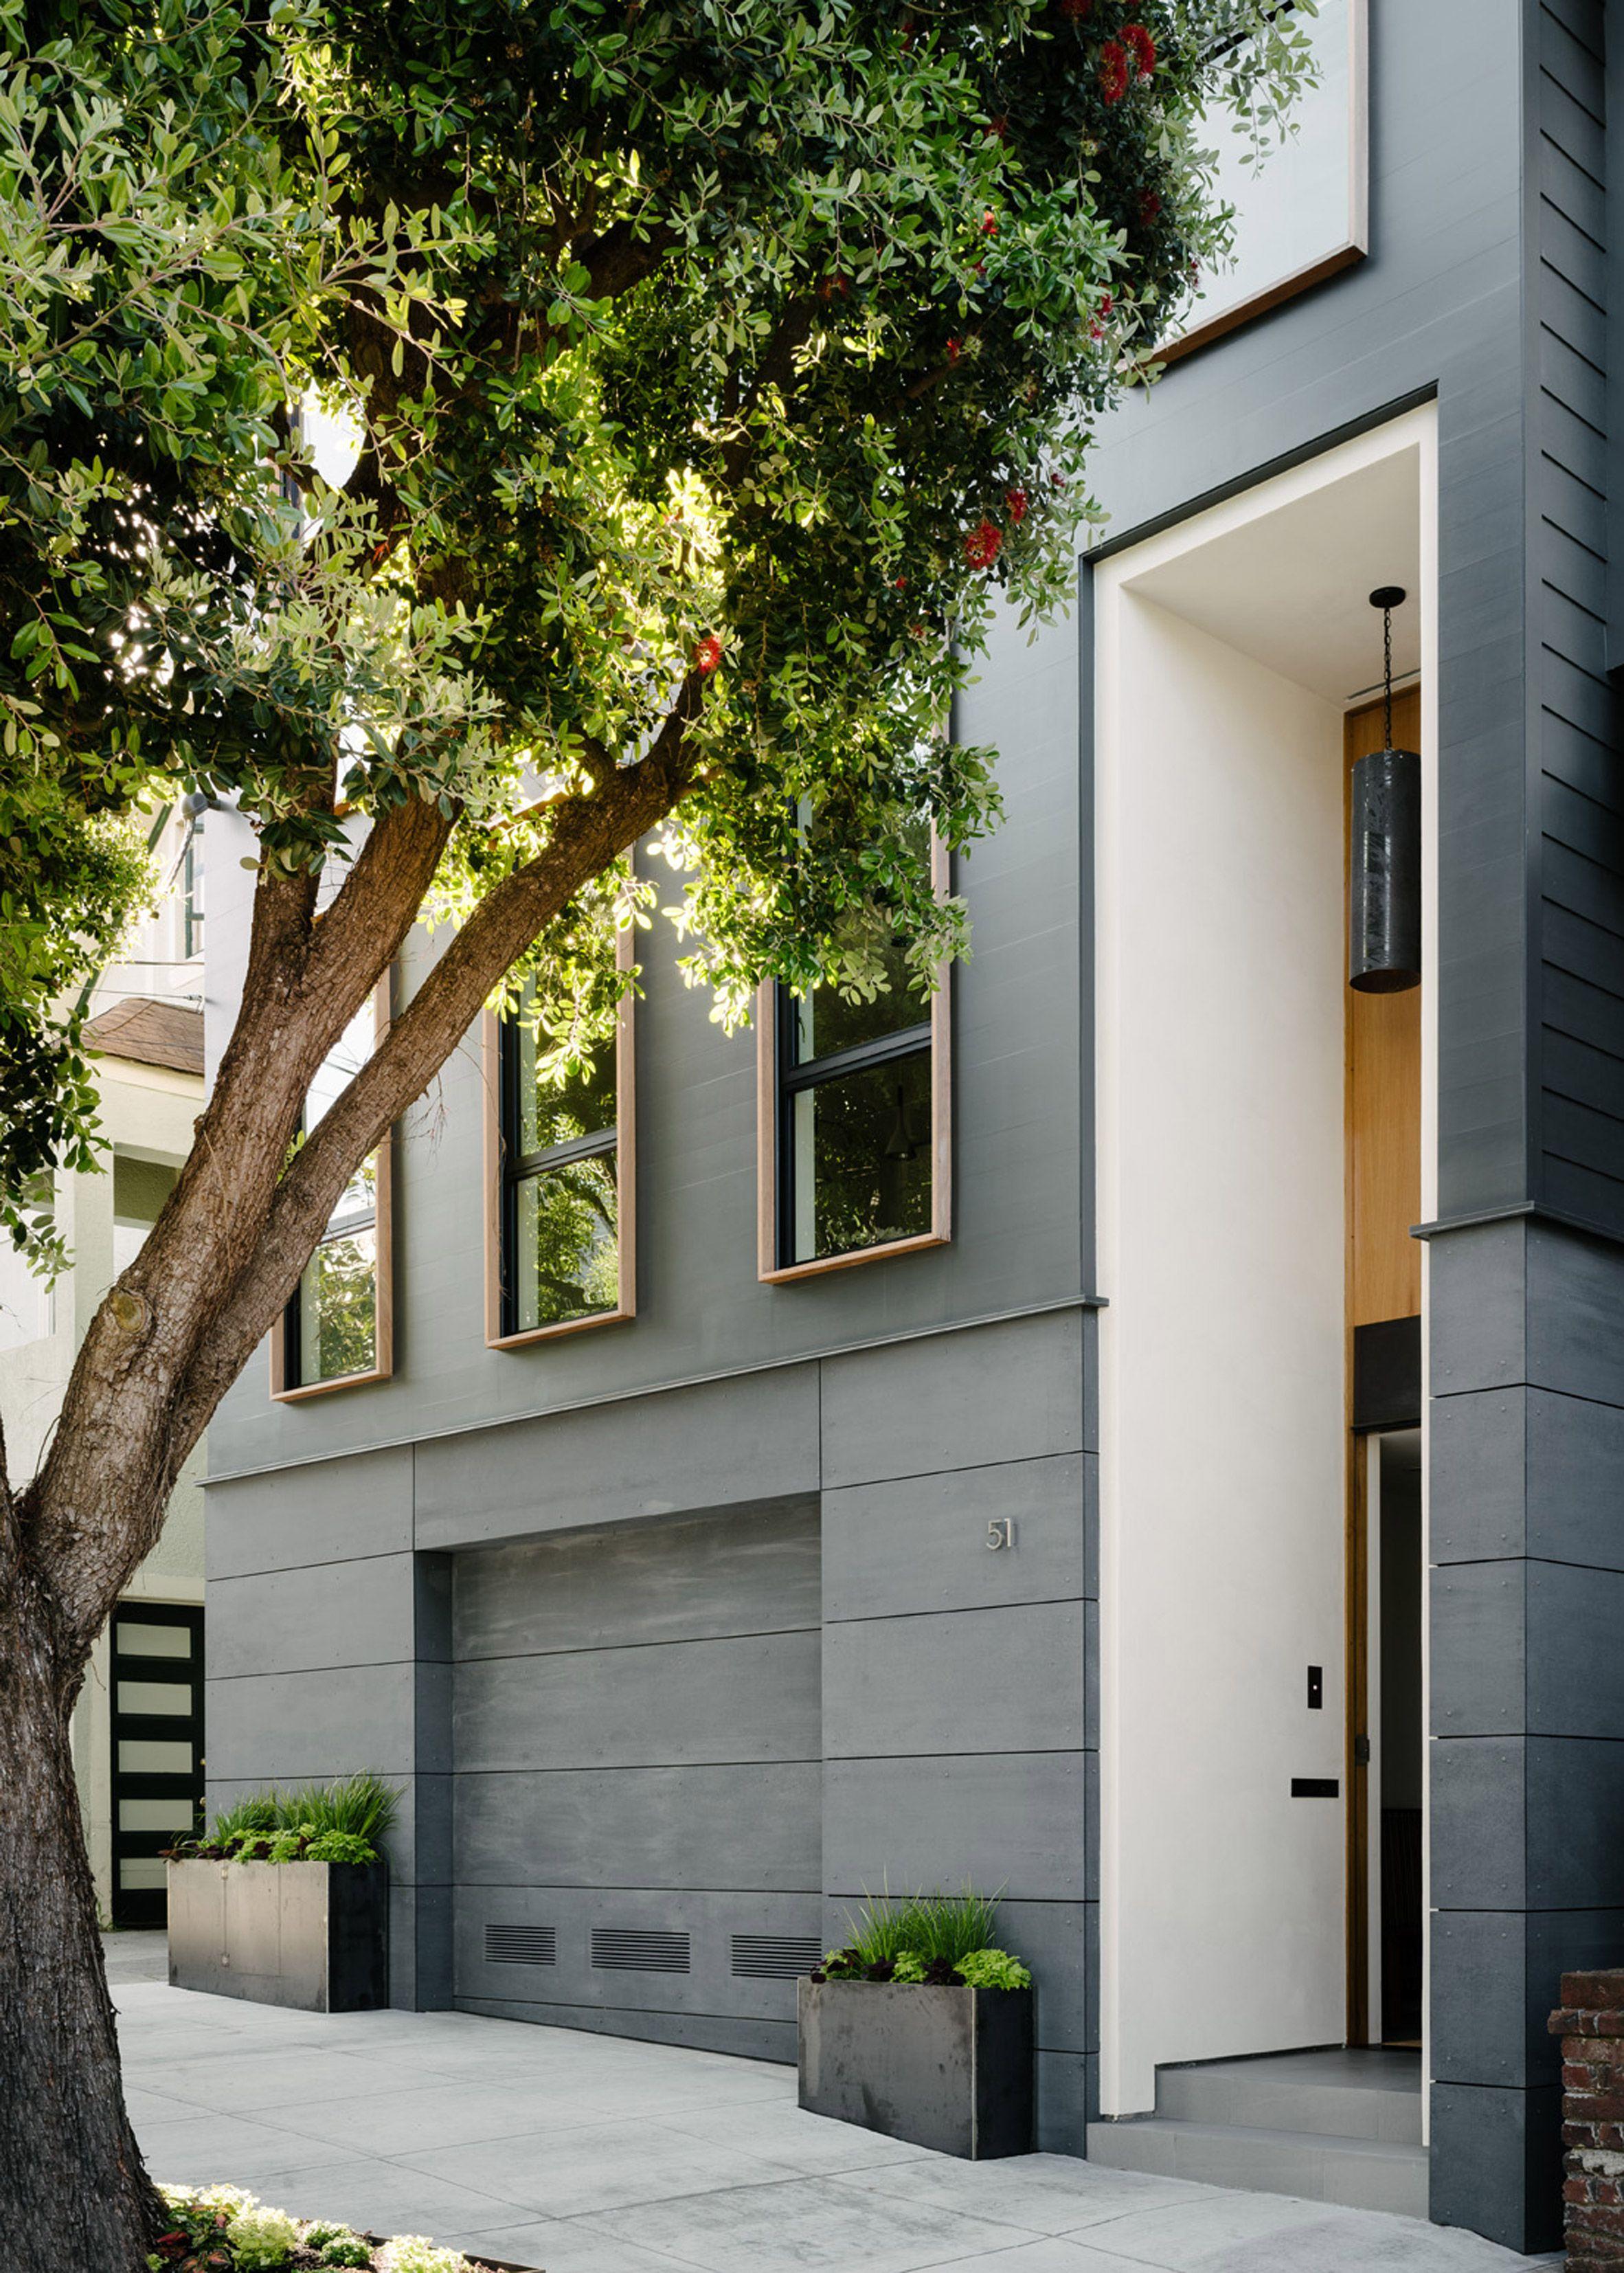 Modern Townhouse Townhouse Designs San Francisco: Architecture, San Francisco Houses, Exterior Design